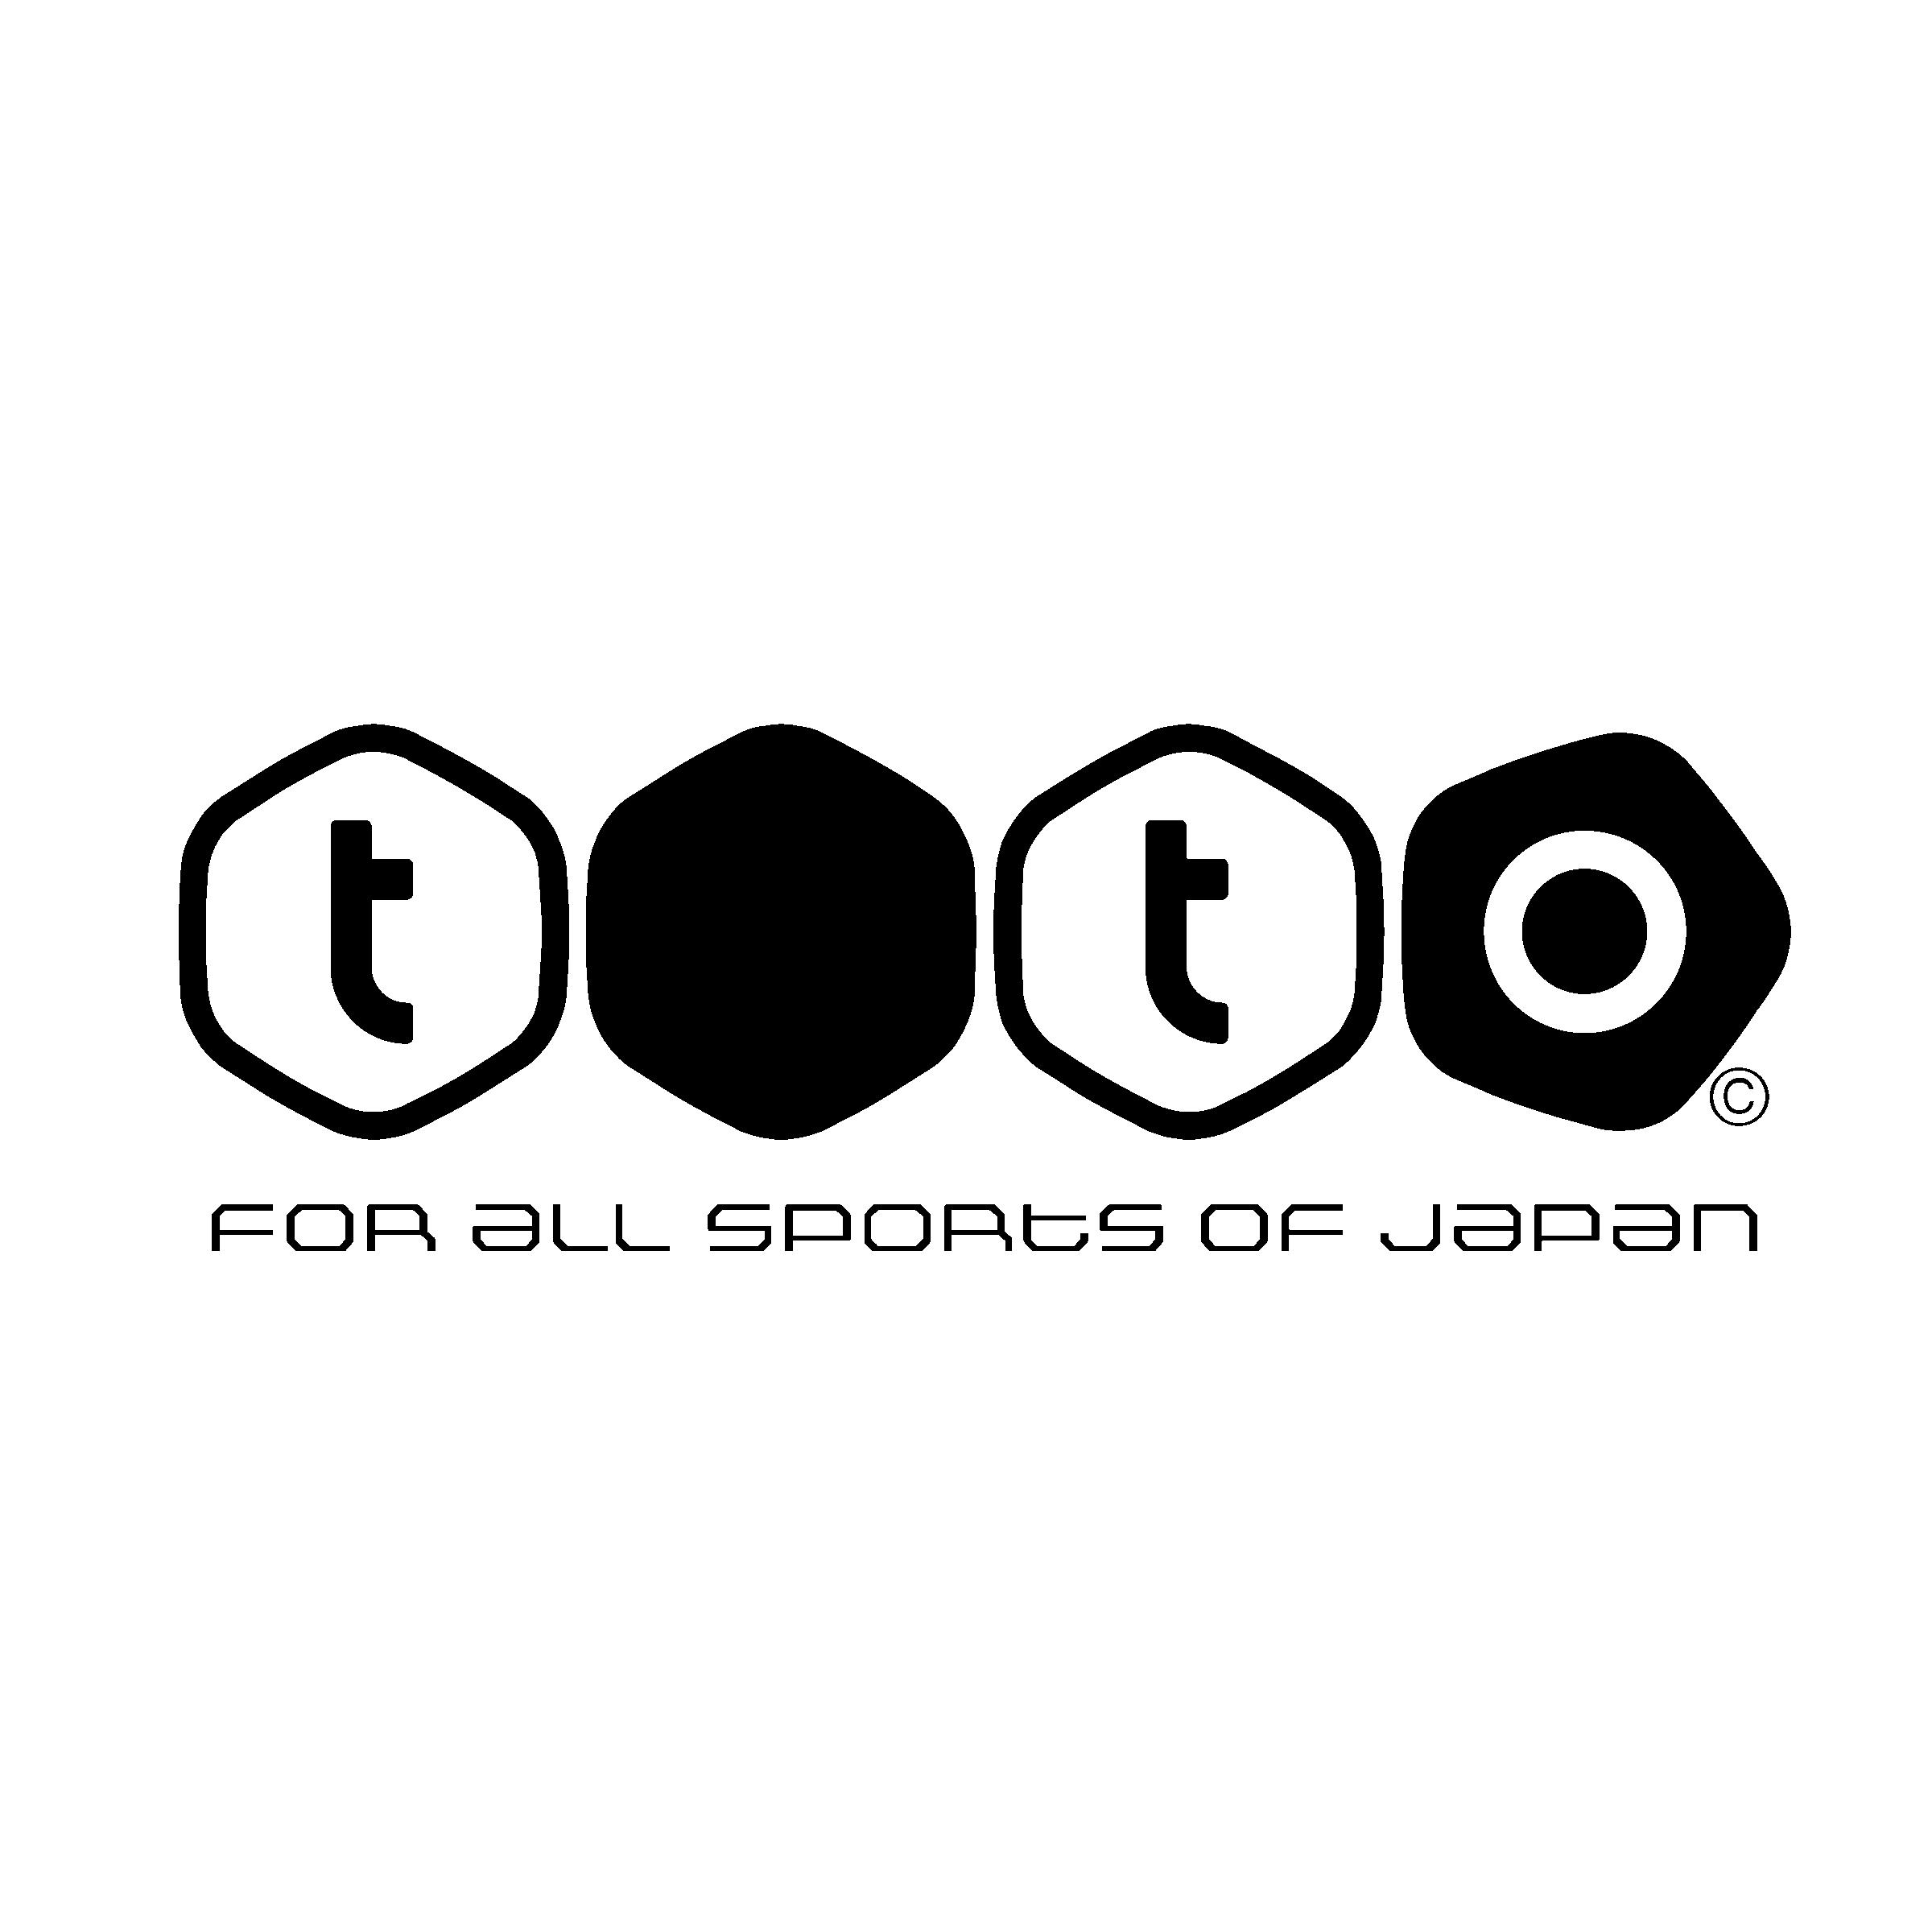 Toto Logo PNG Transparent & SVG Vector - Freebie Supply